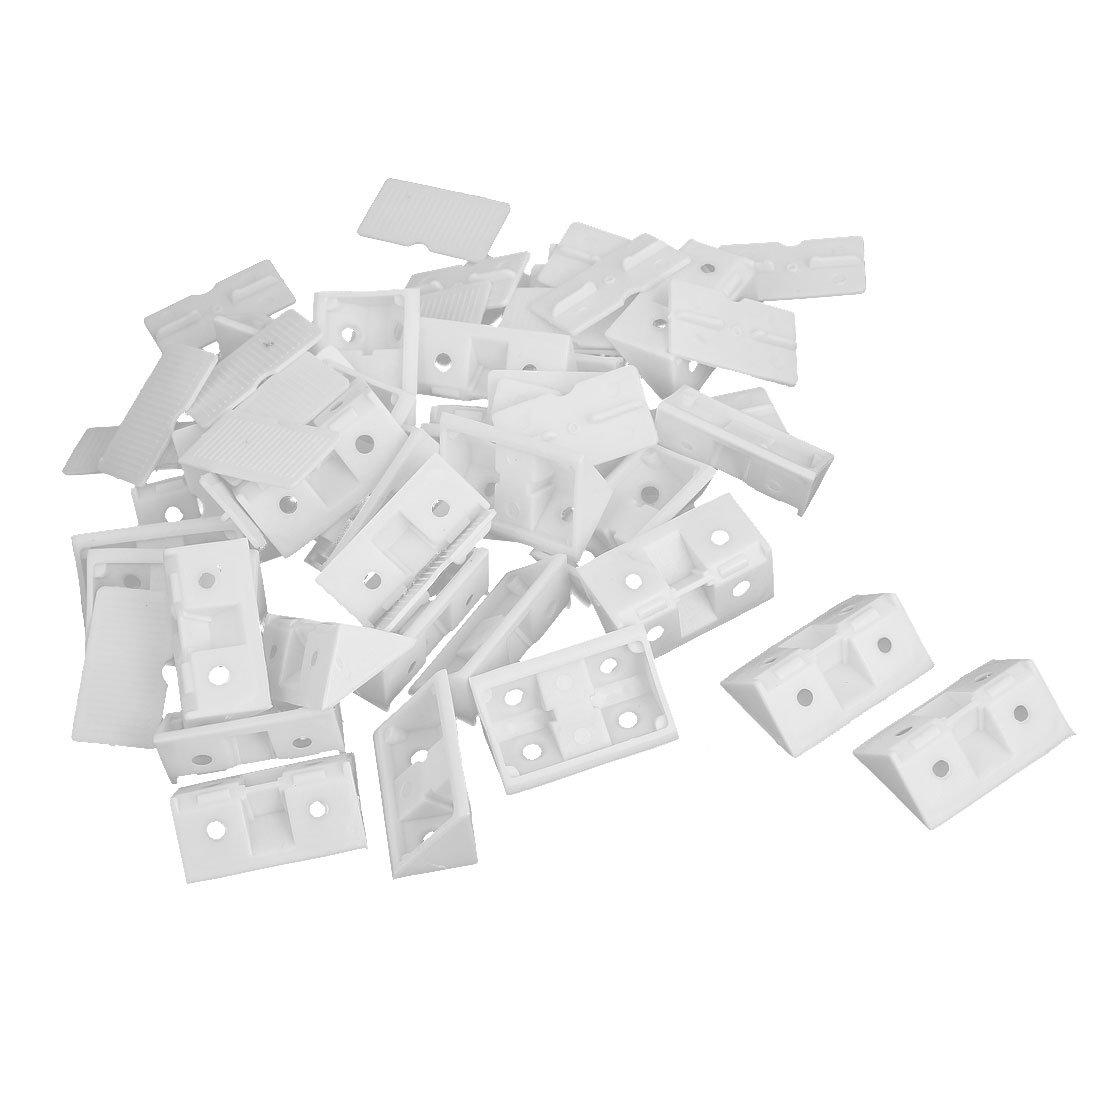 Shelf Cabinet 90 Degree Plastic Corner Braces Angle Brackets 30pcs